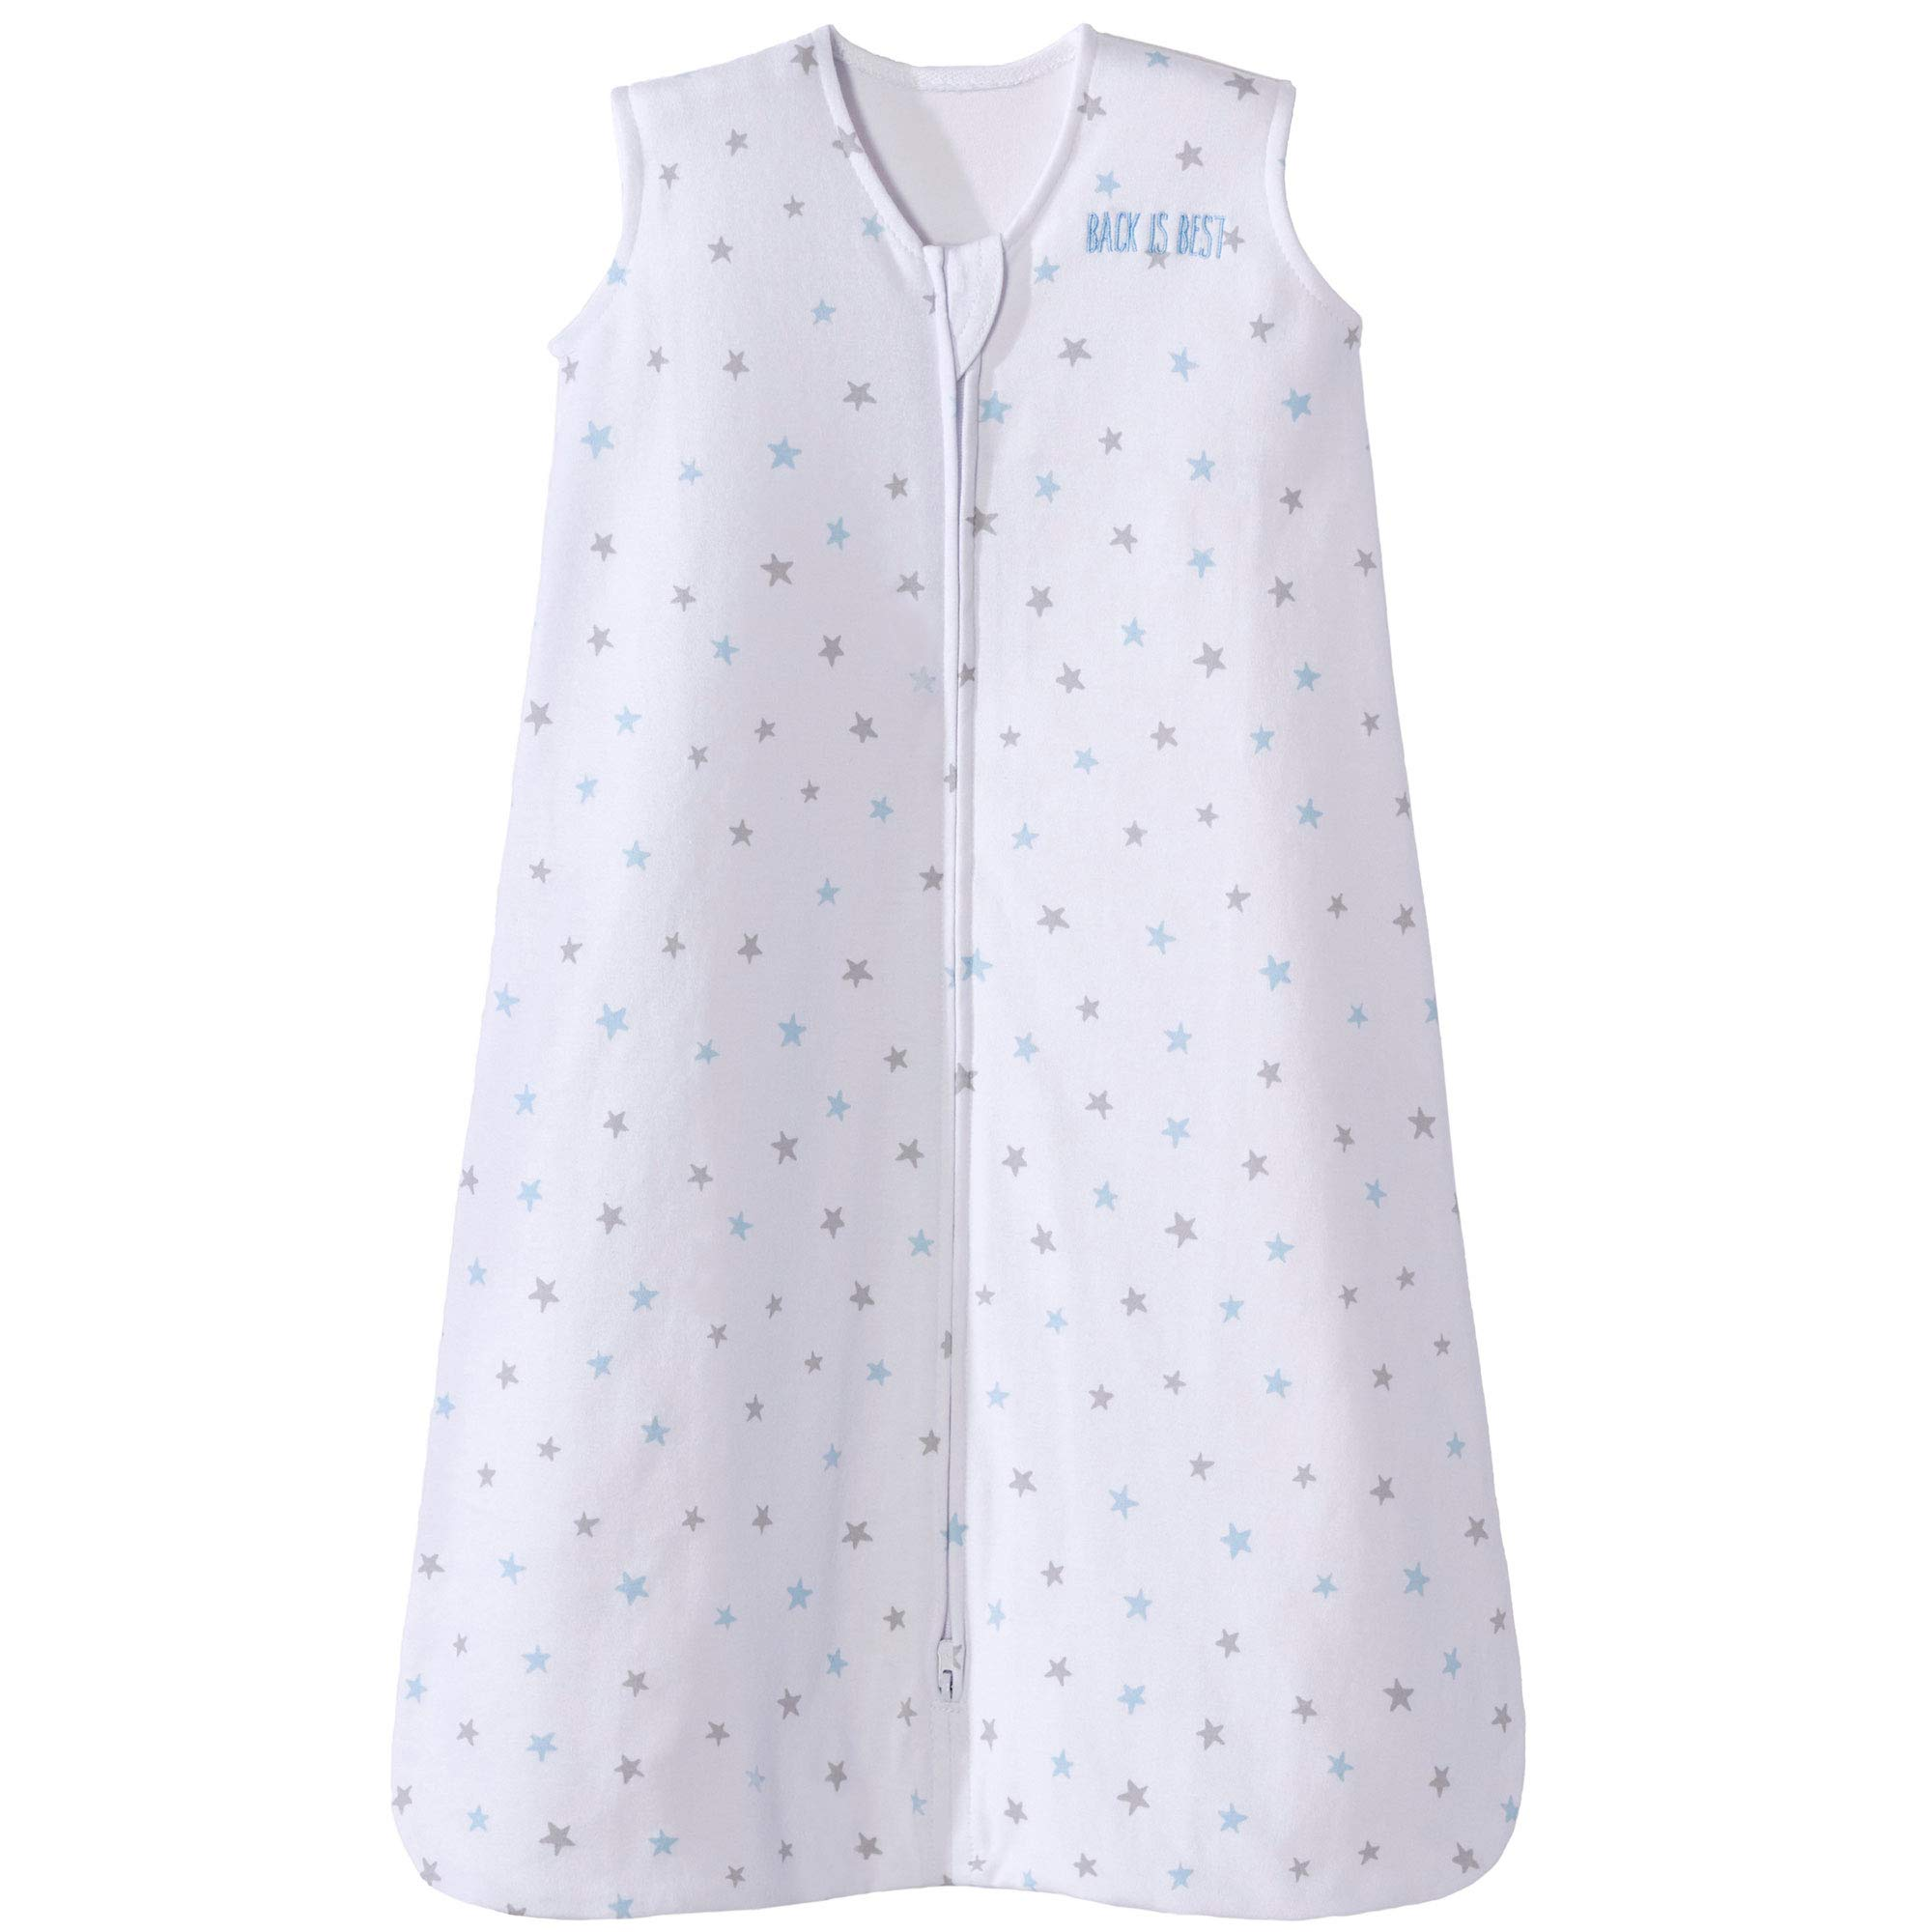 Halo Sleepsack Cotton Wearable Blanket, Blue Stars, X-Large by Halo